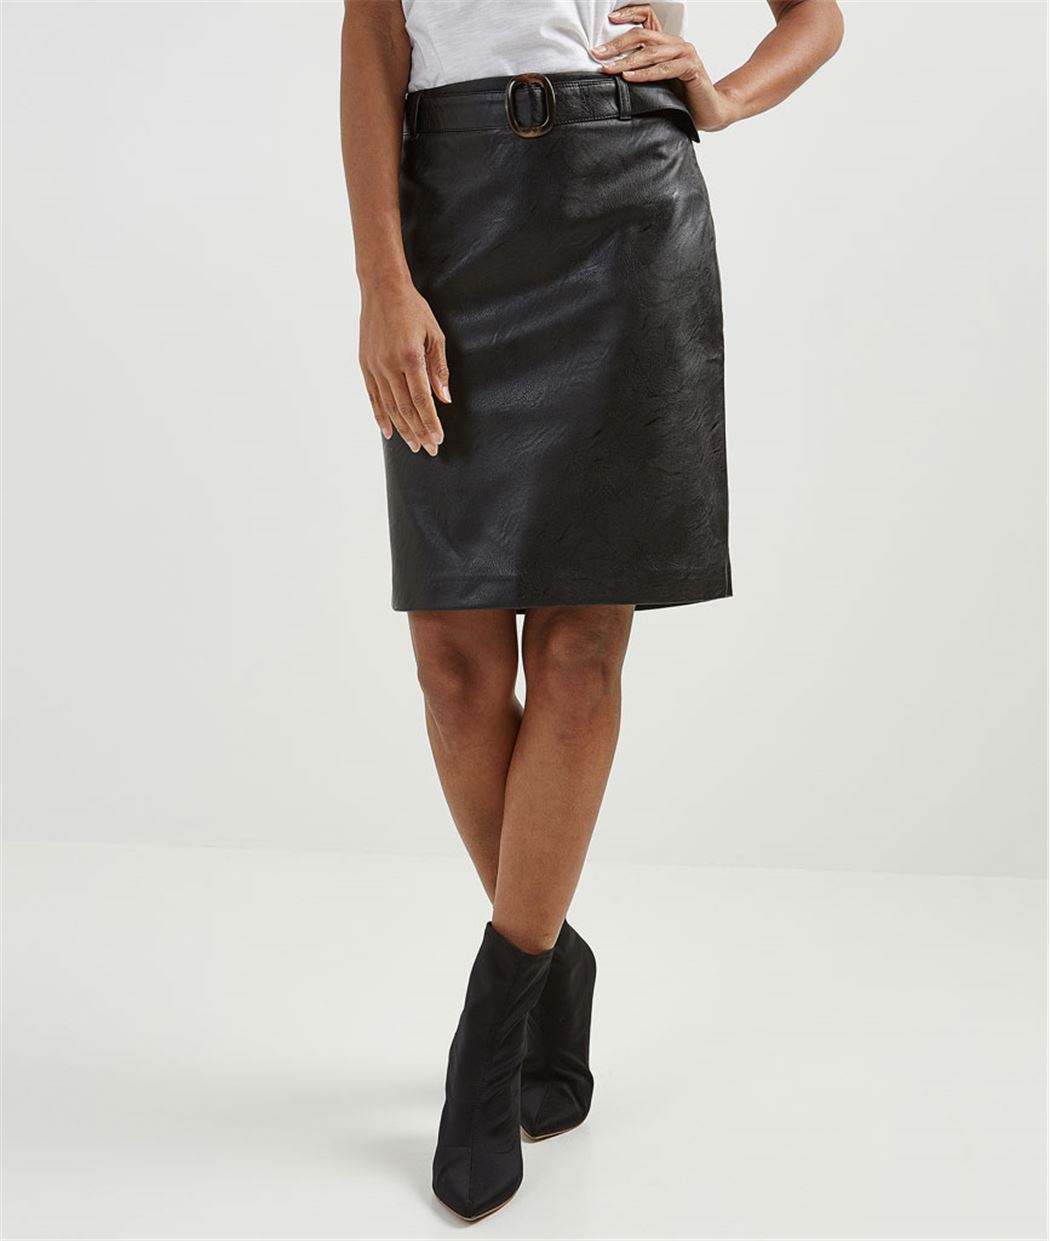 jupe femme en simili cuir noir grain de malice. Black Bedroom Furniture Sets. Home Design Ideas